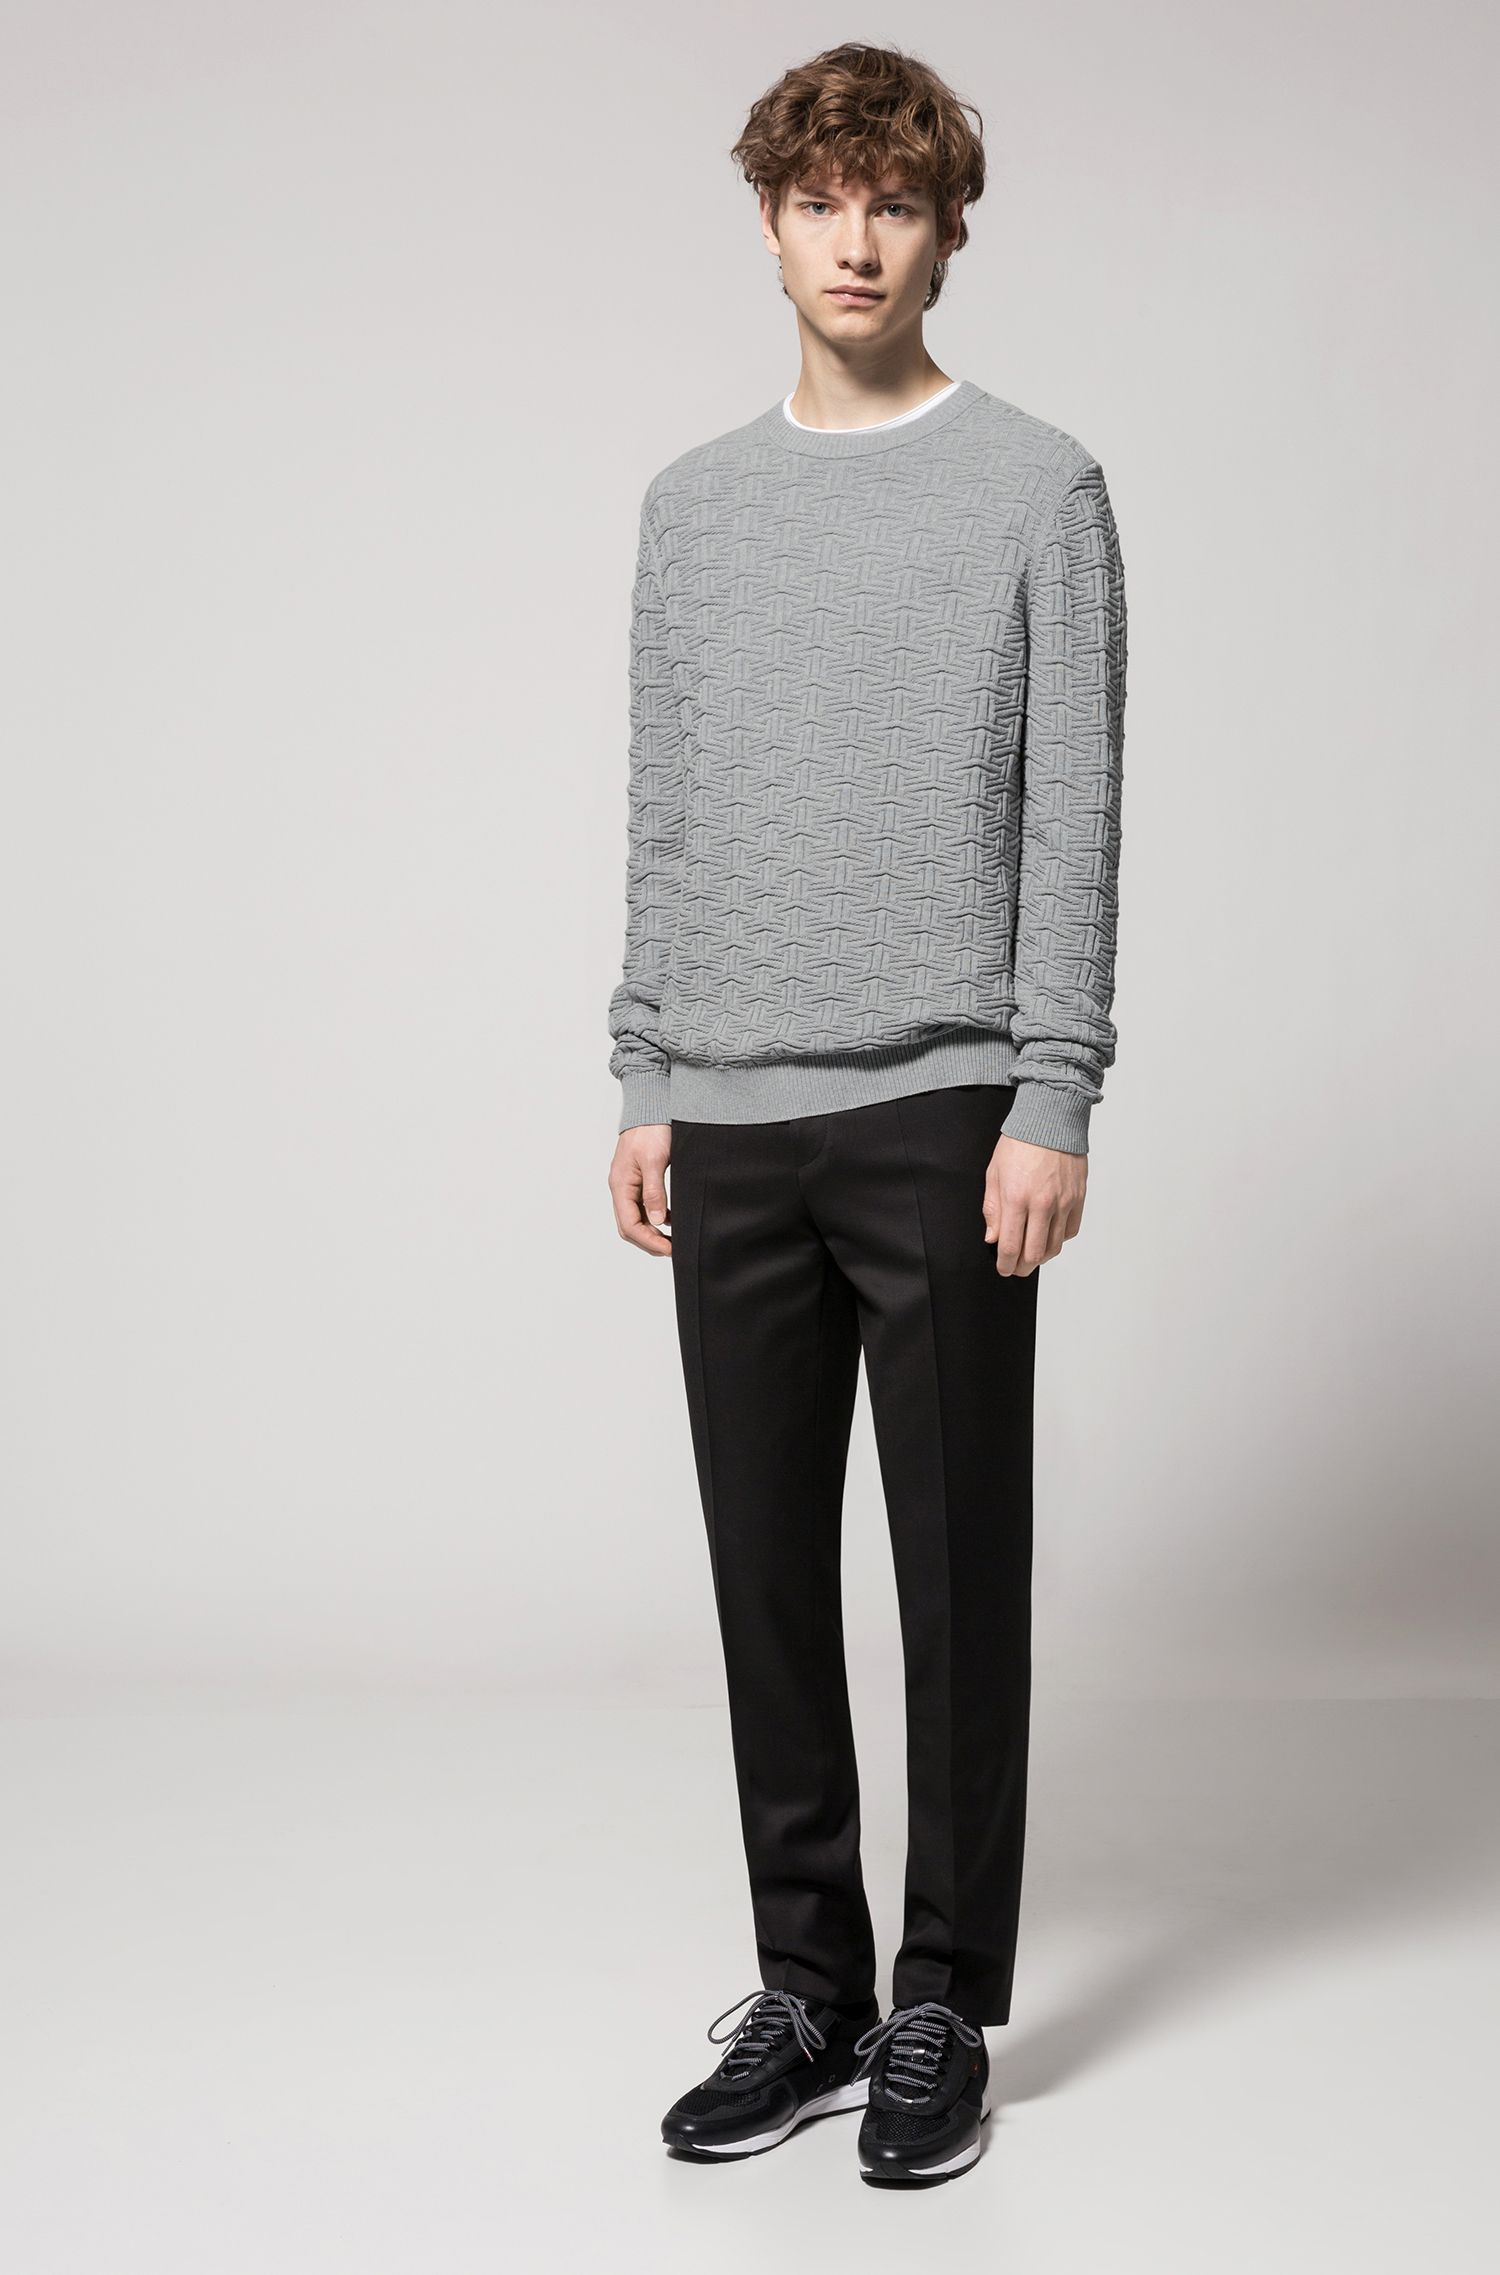 Sweater in three-dimensional cotton jacquard